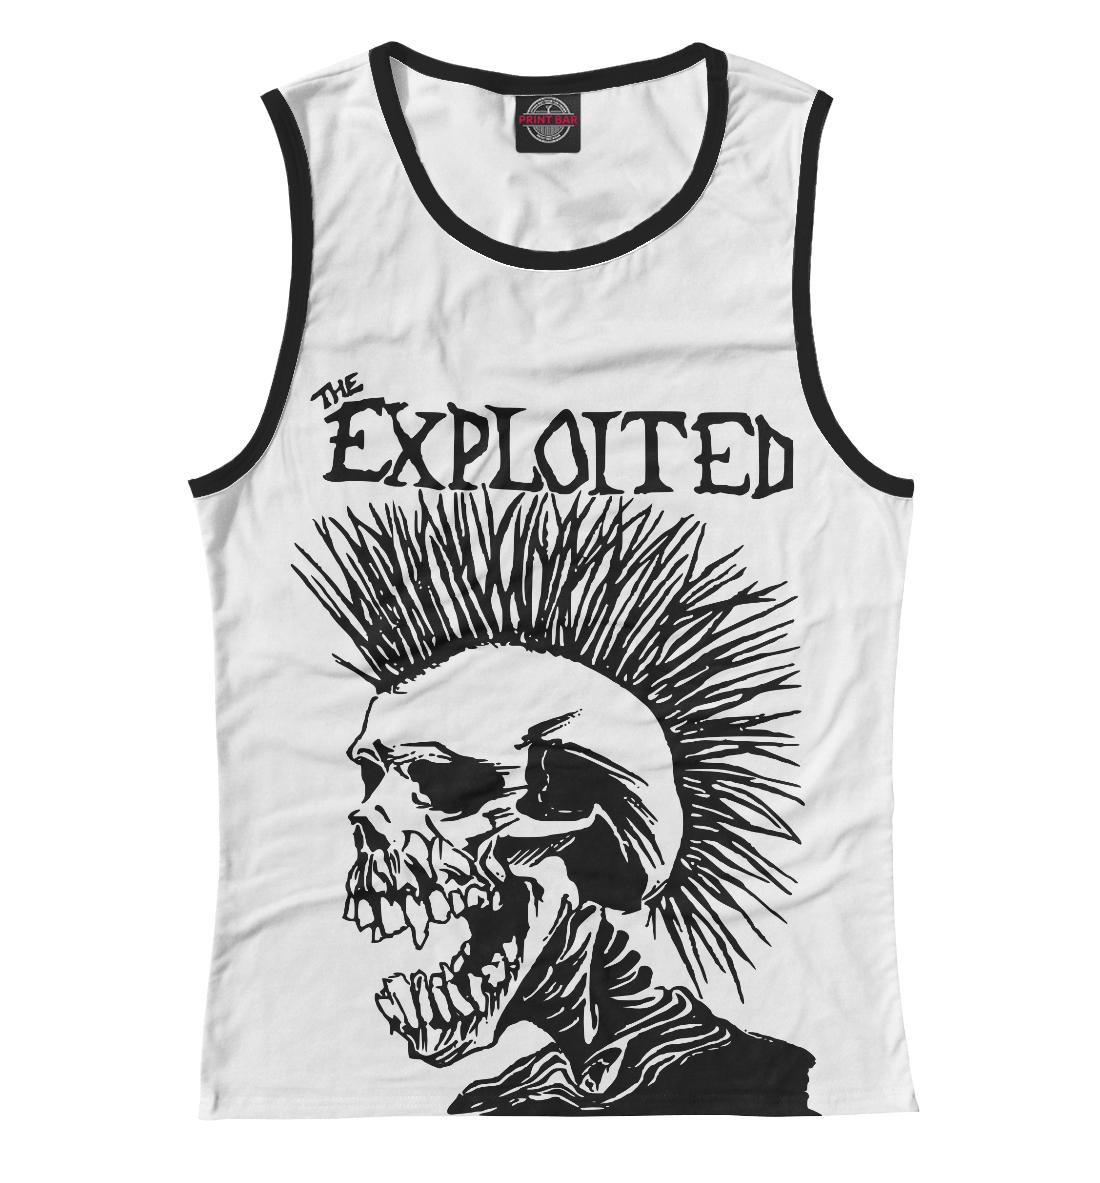 Купить The Exploited, Printbar, Майки, MZK-456298-may-1